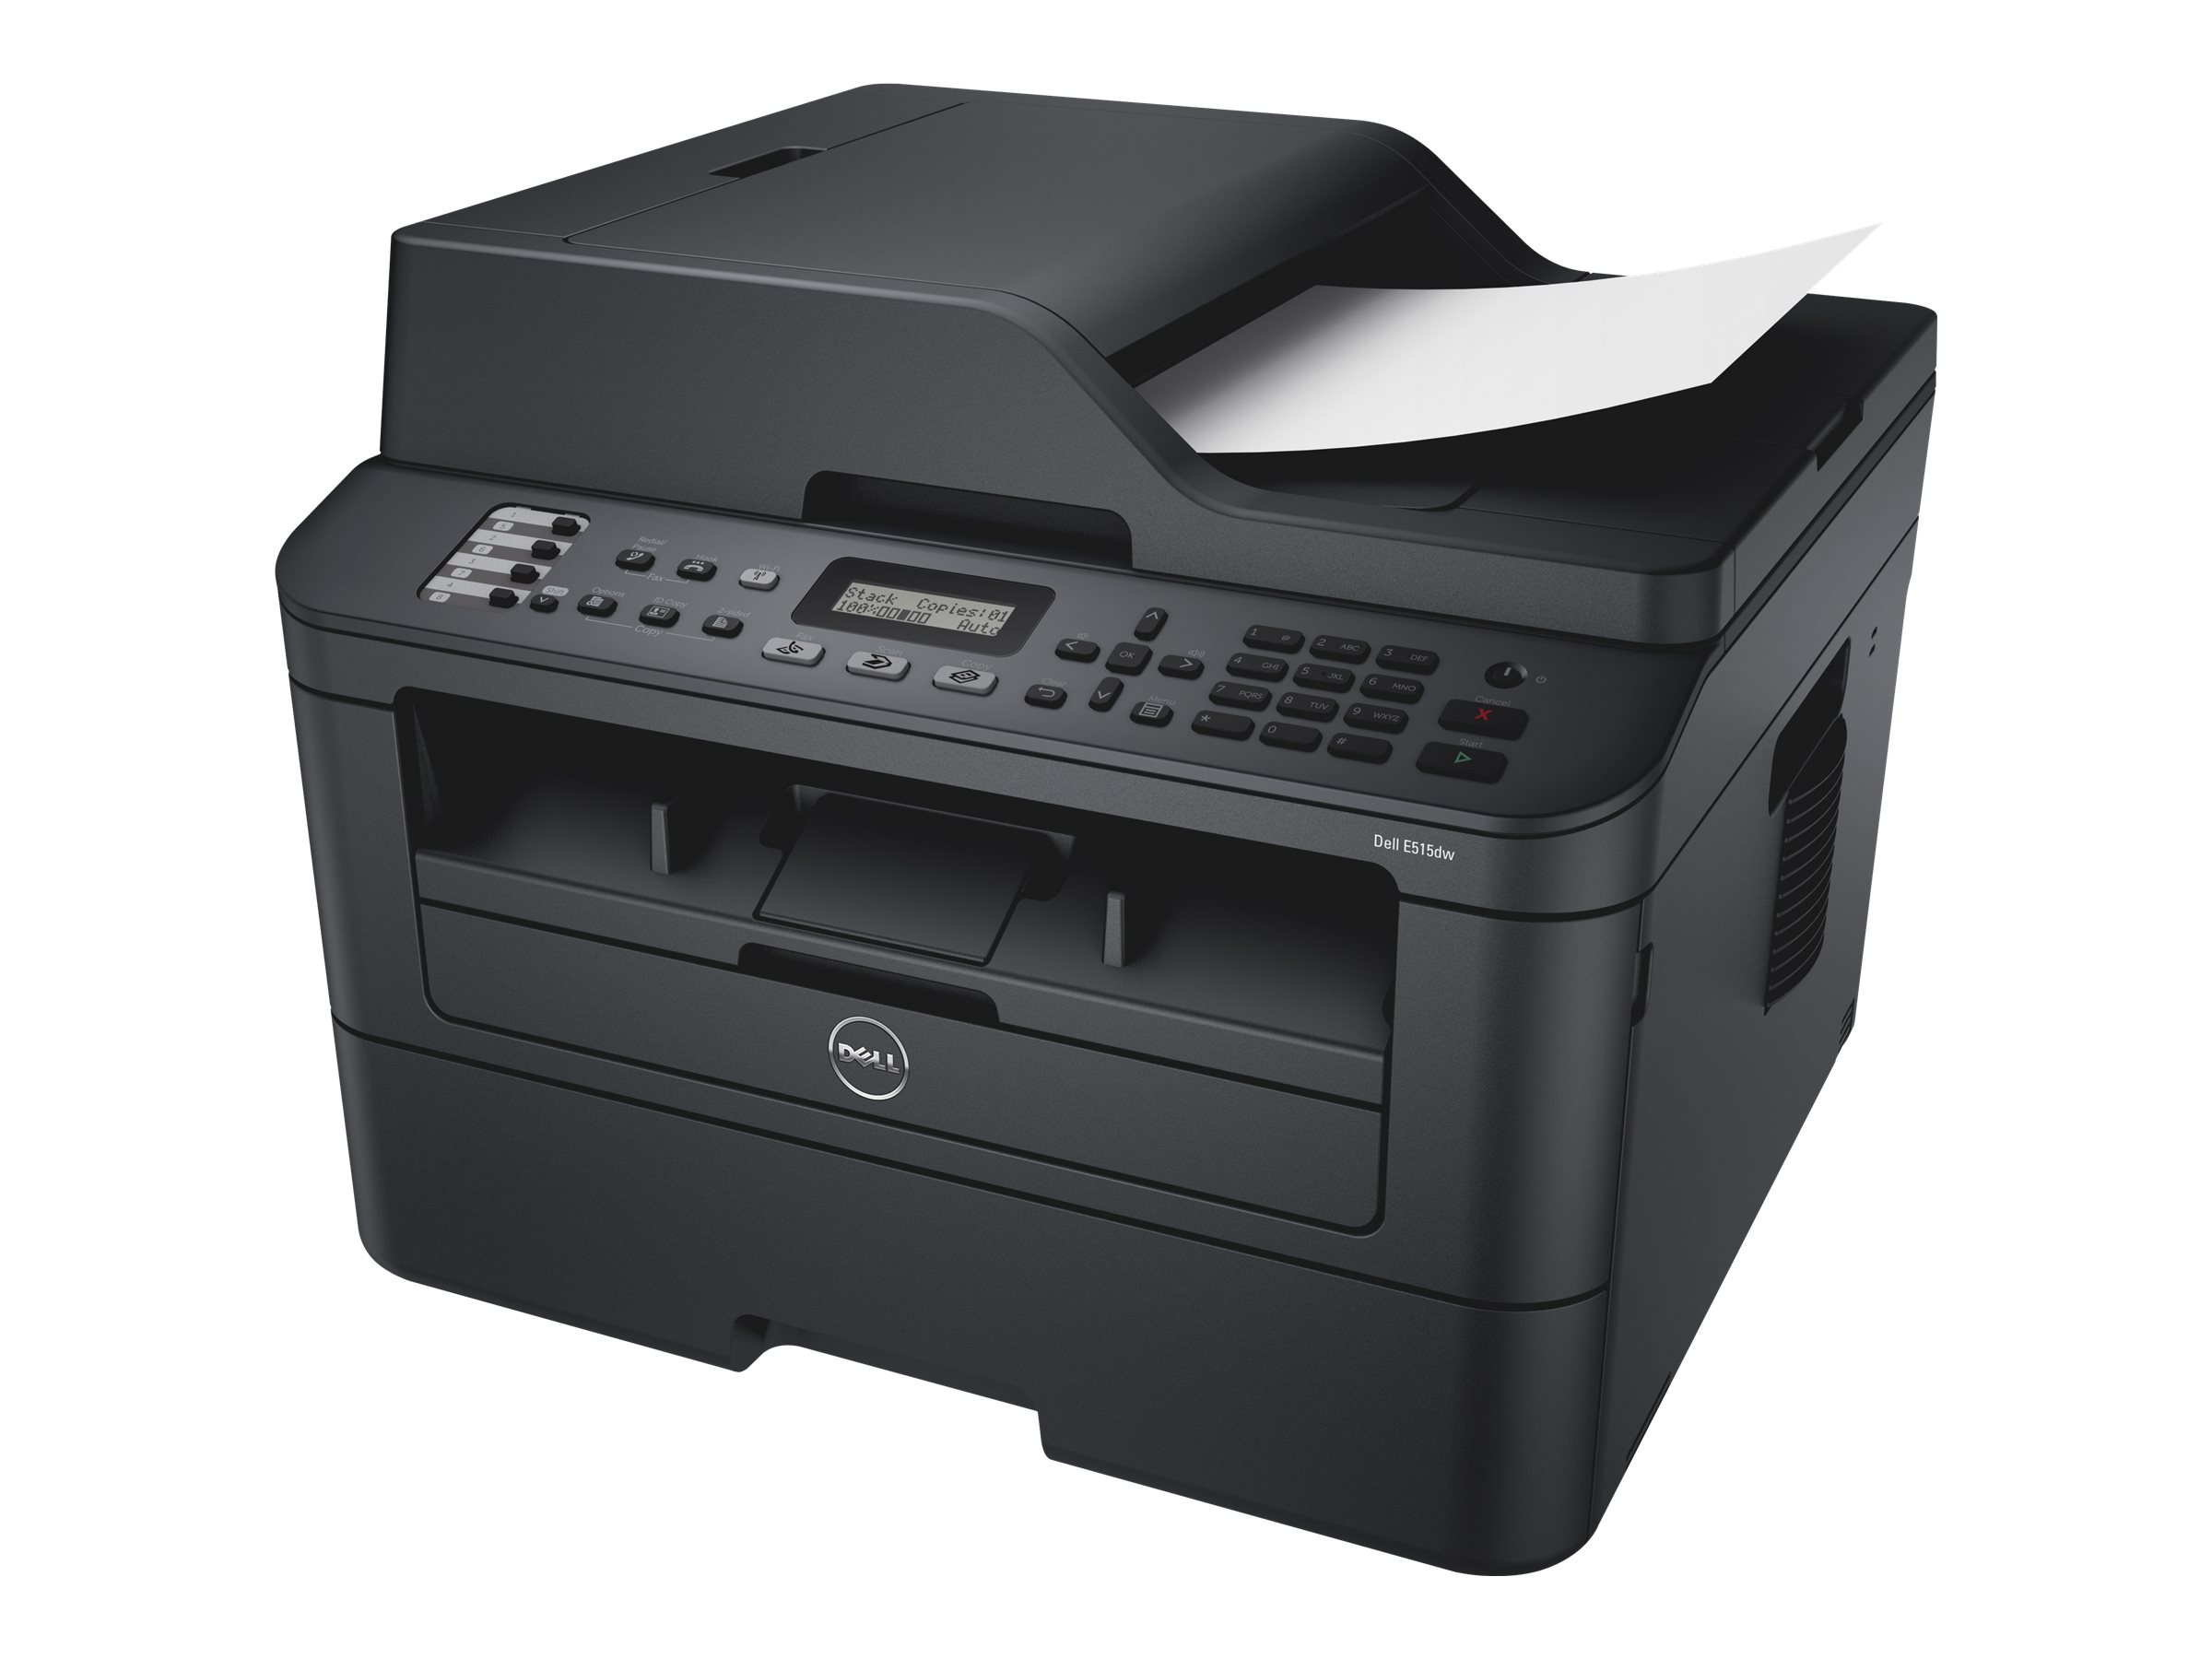 E515DN MONO LASER 27PPM 2400 X 600 DPI A4 USB DUPL   Walmart.com